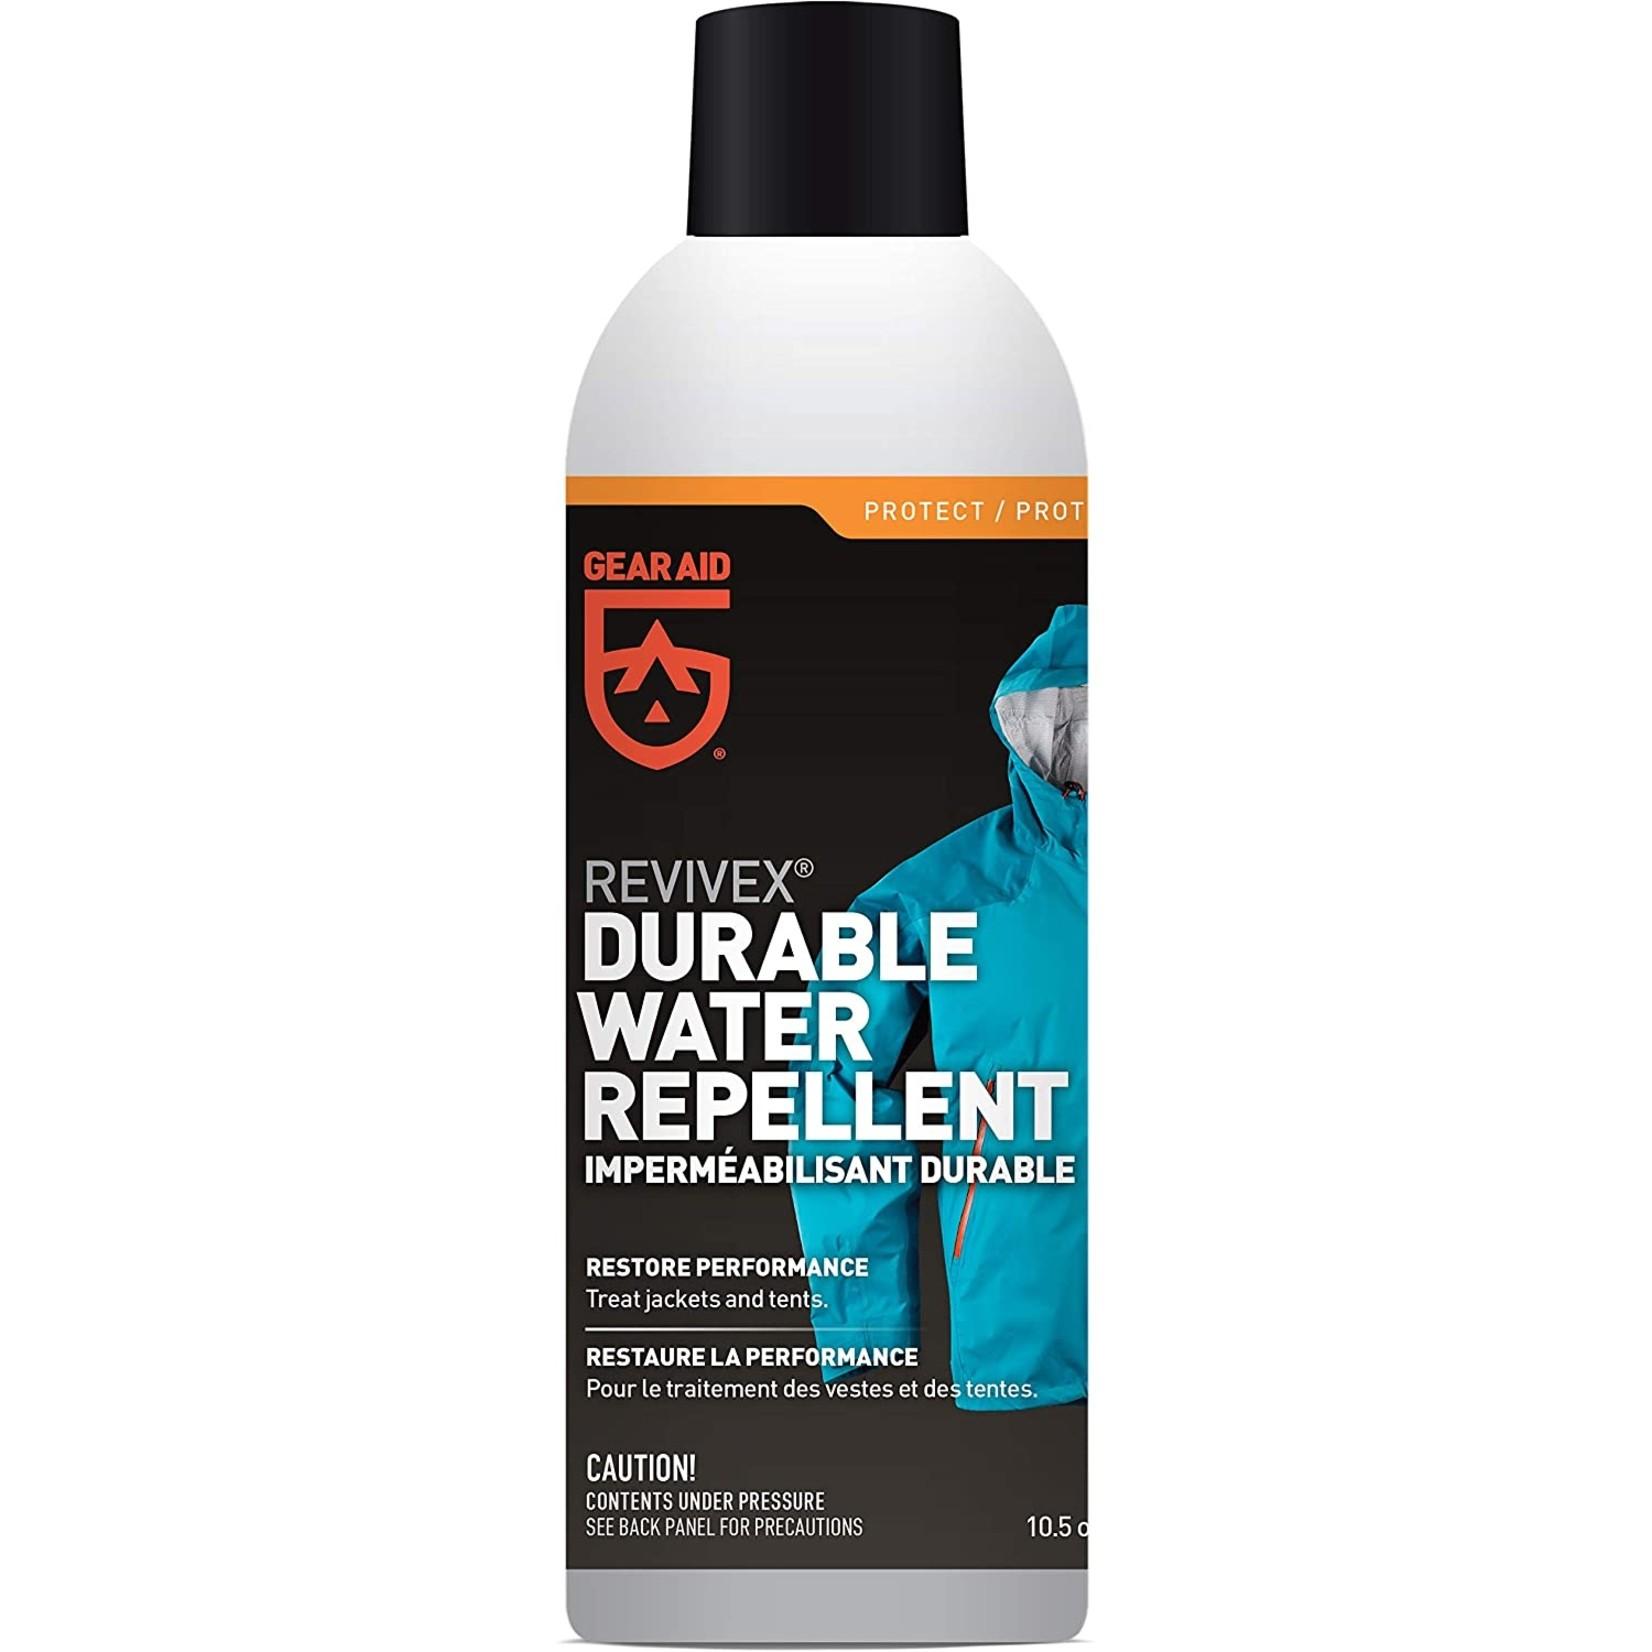 Revivex Durable Water Repellent 10.5 oz